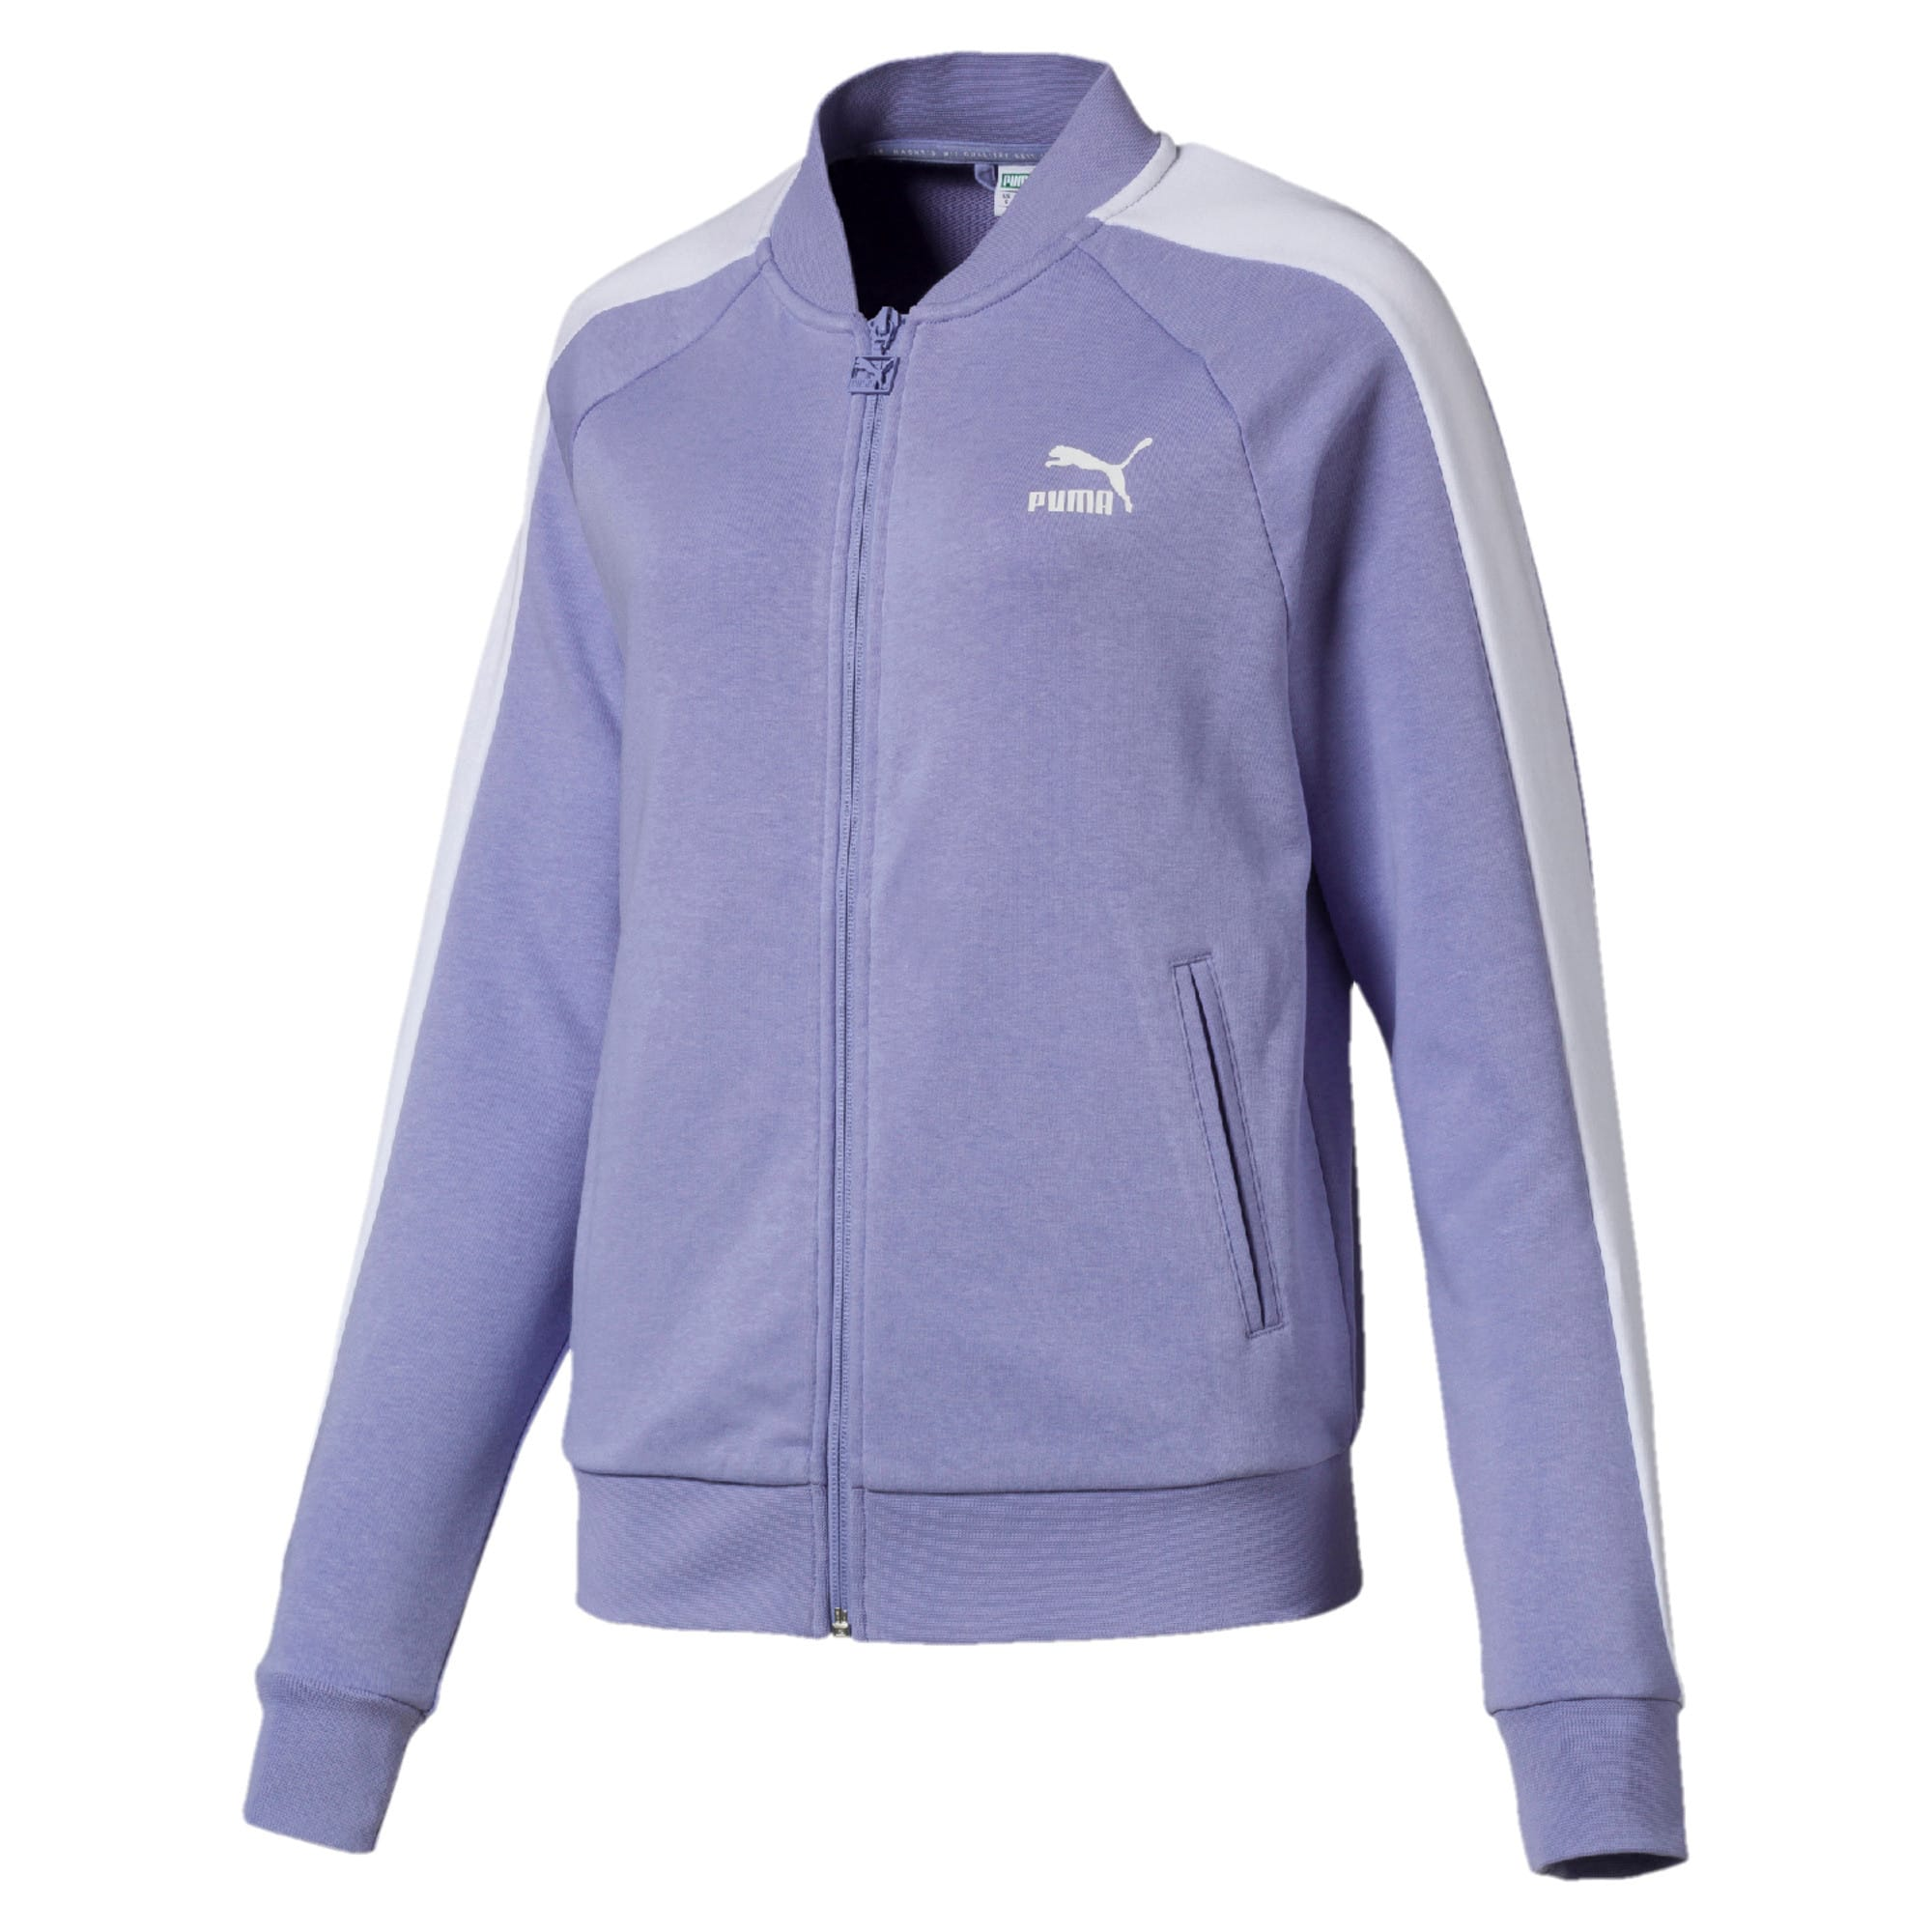 Thumbnail 1 of Classics Women's T7 Track Jacket, Sweet Lavender, medium